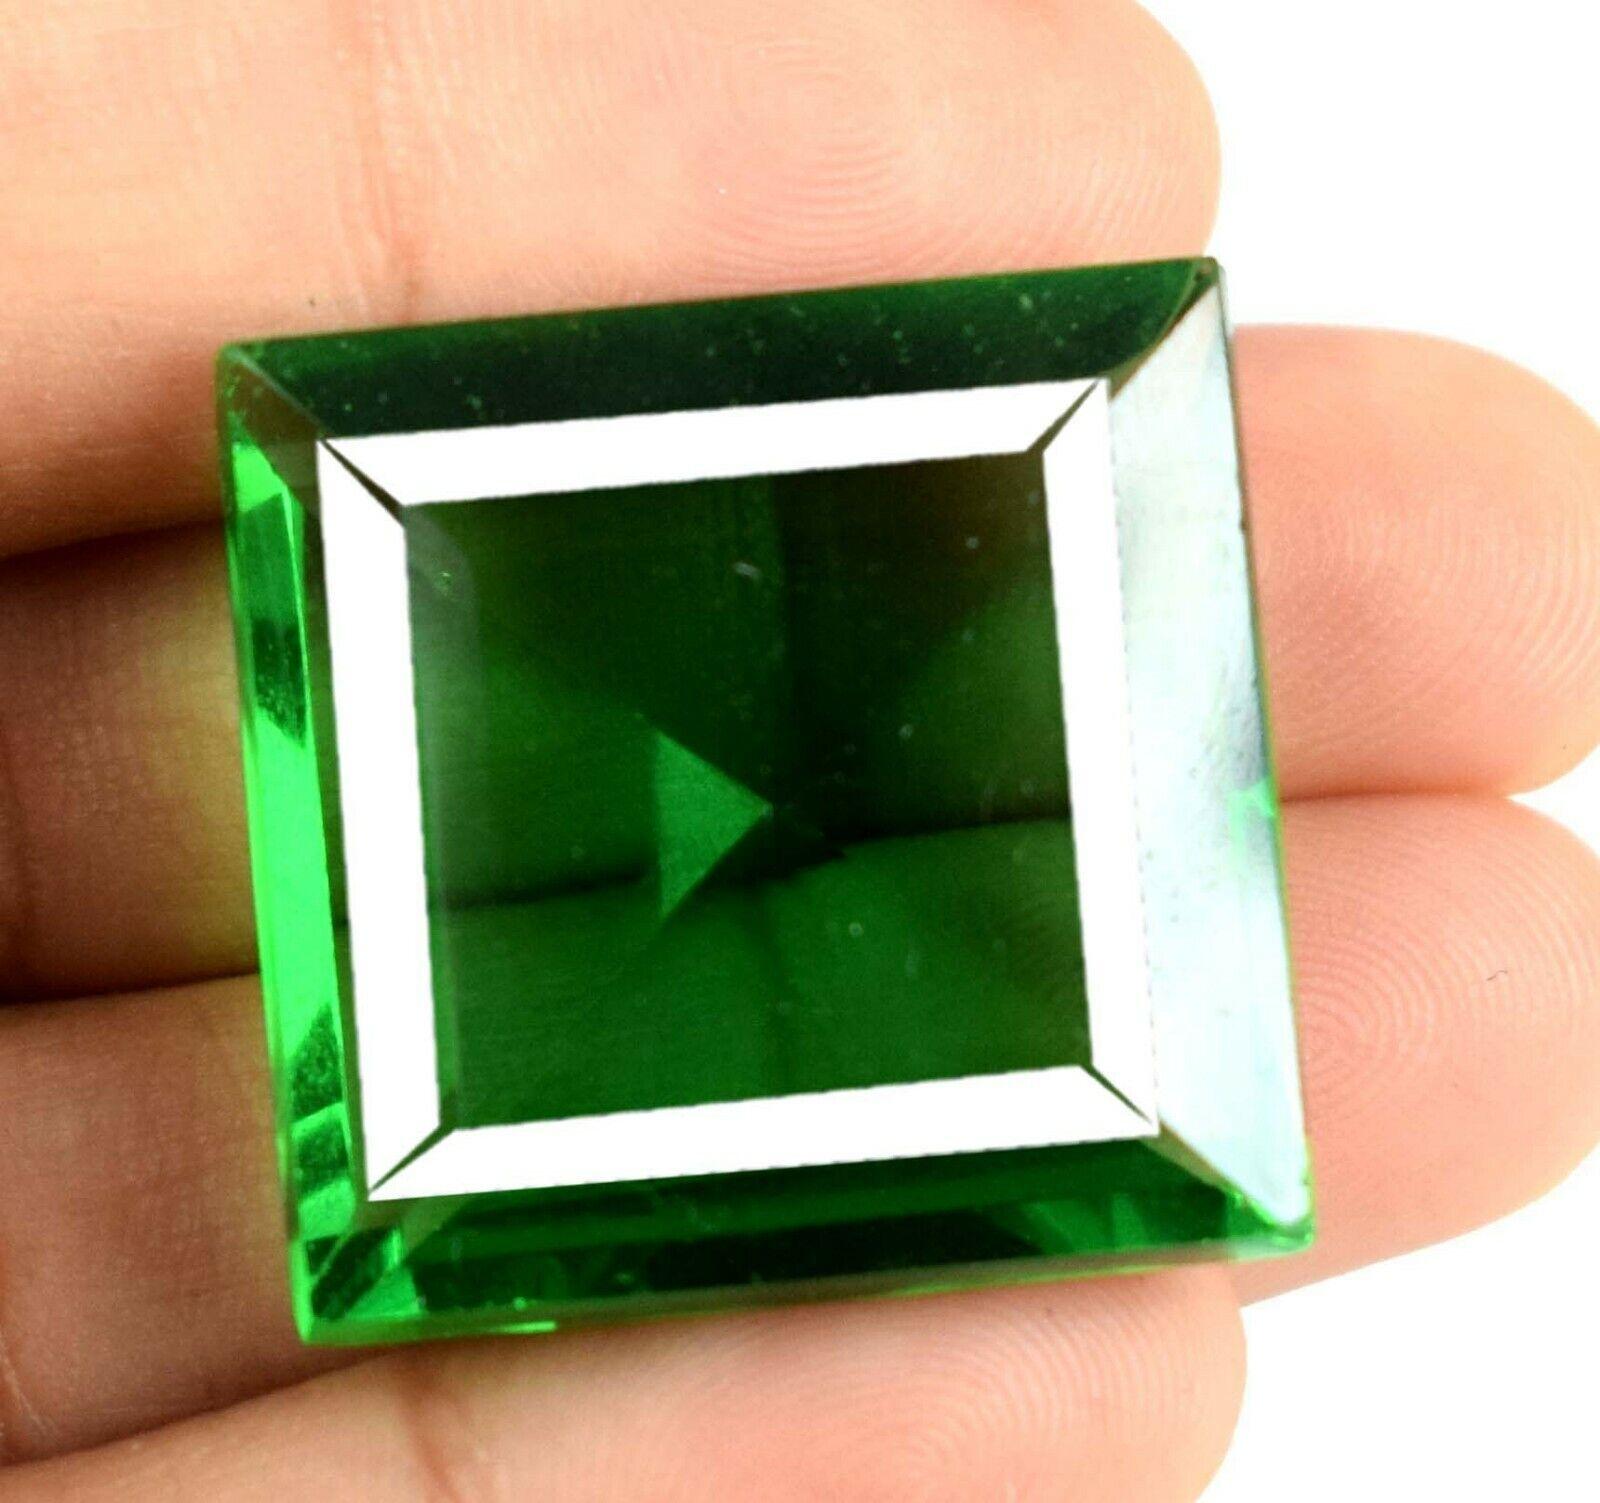 Festivo Sales Verde Tectita Moldavite 57 CT Corte Cuadrado Piedra Certificado